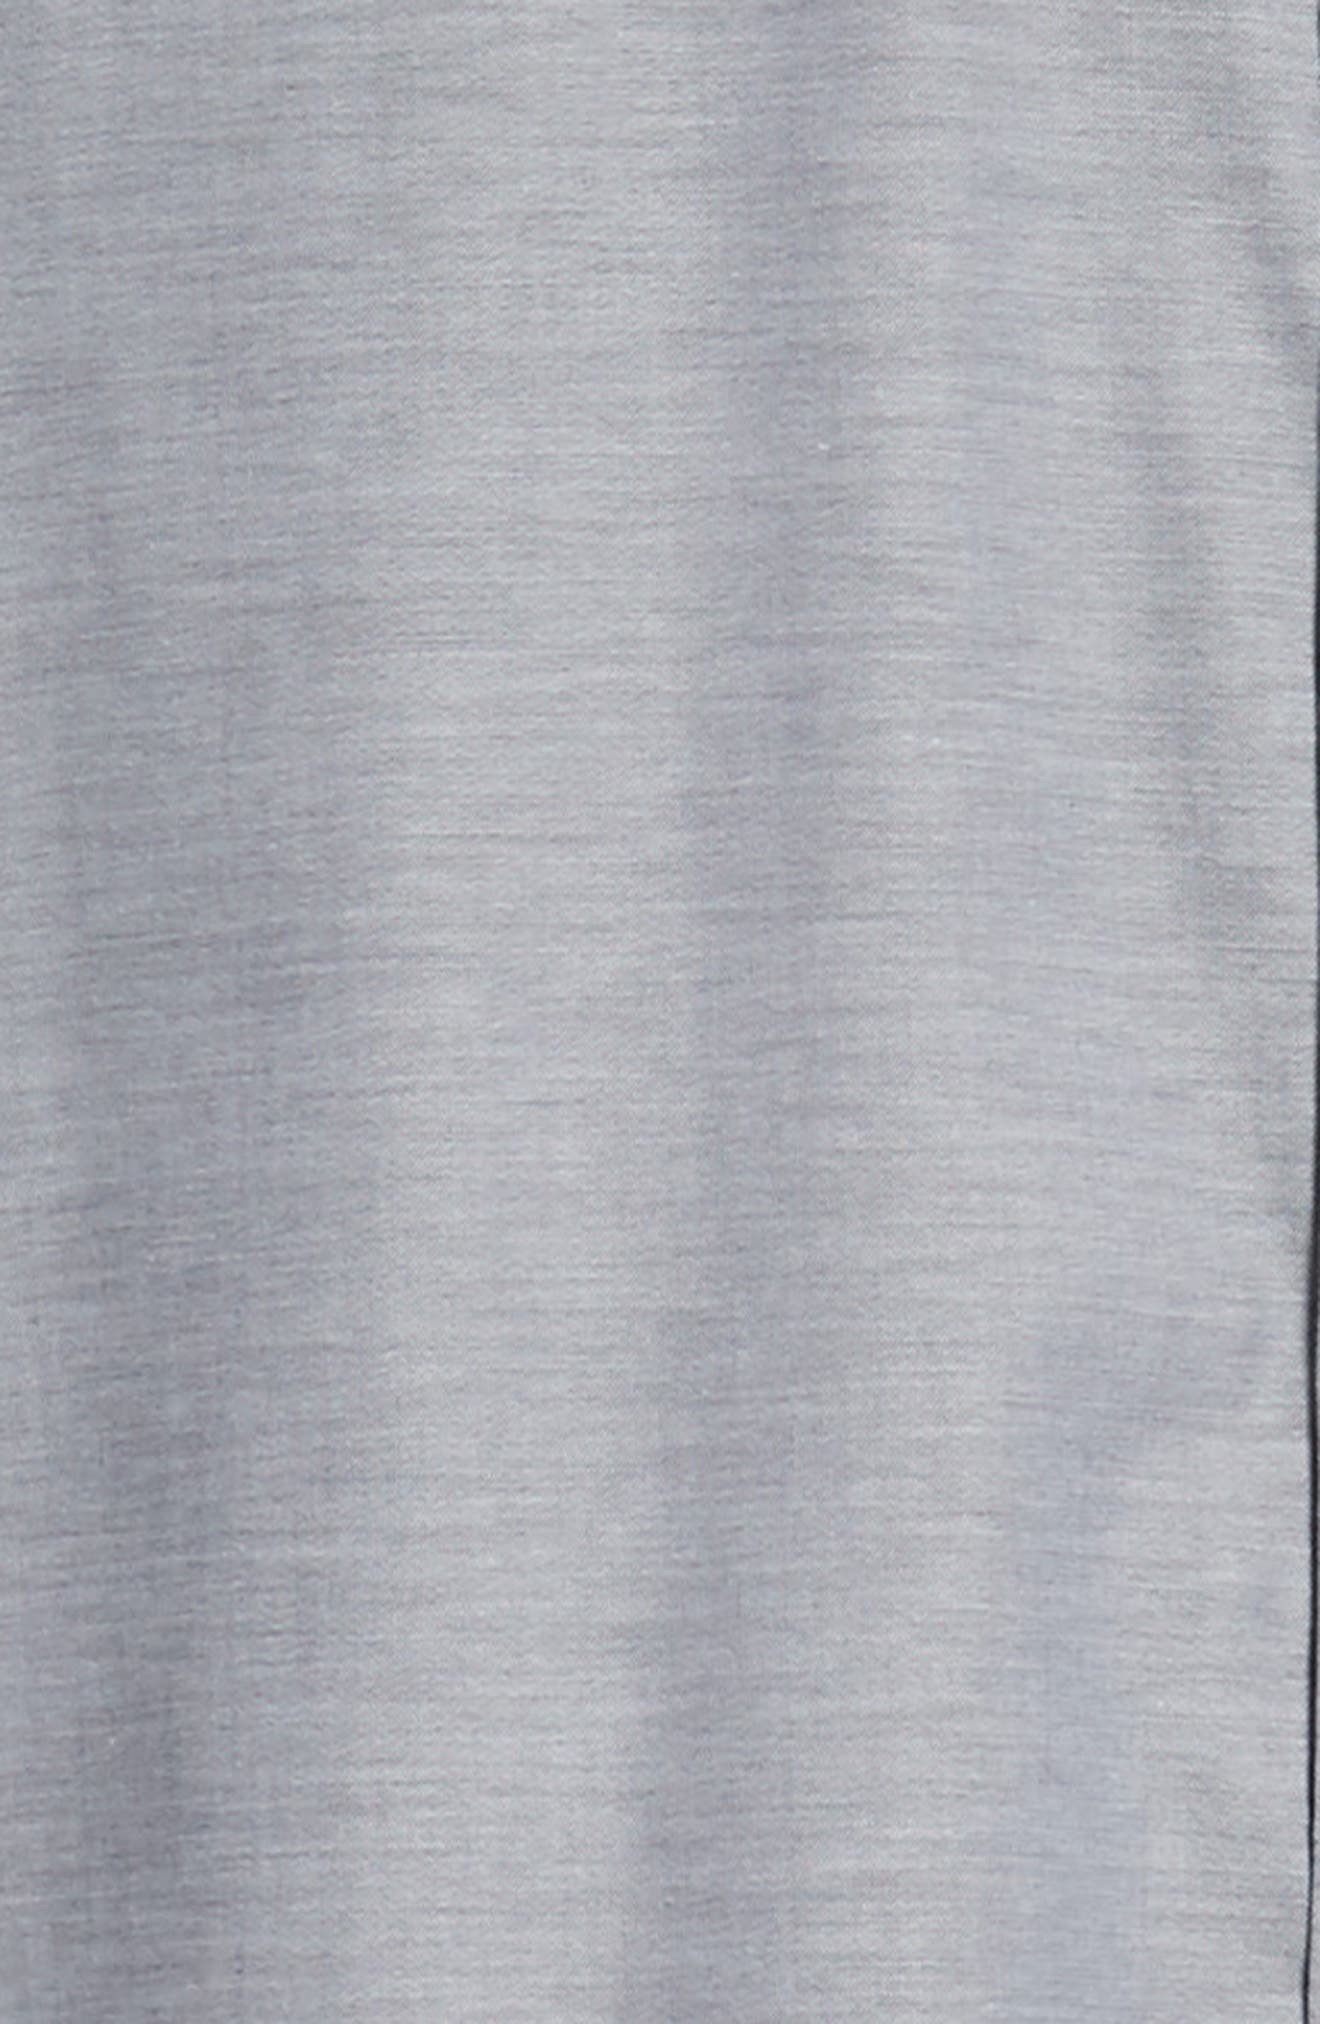 Tailor Regular Fit Oxford Sport Shirt,                             Alternate thumbnail 6, color,                             CHARCOAL 2